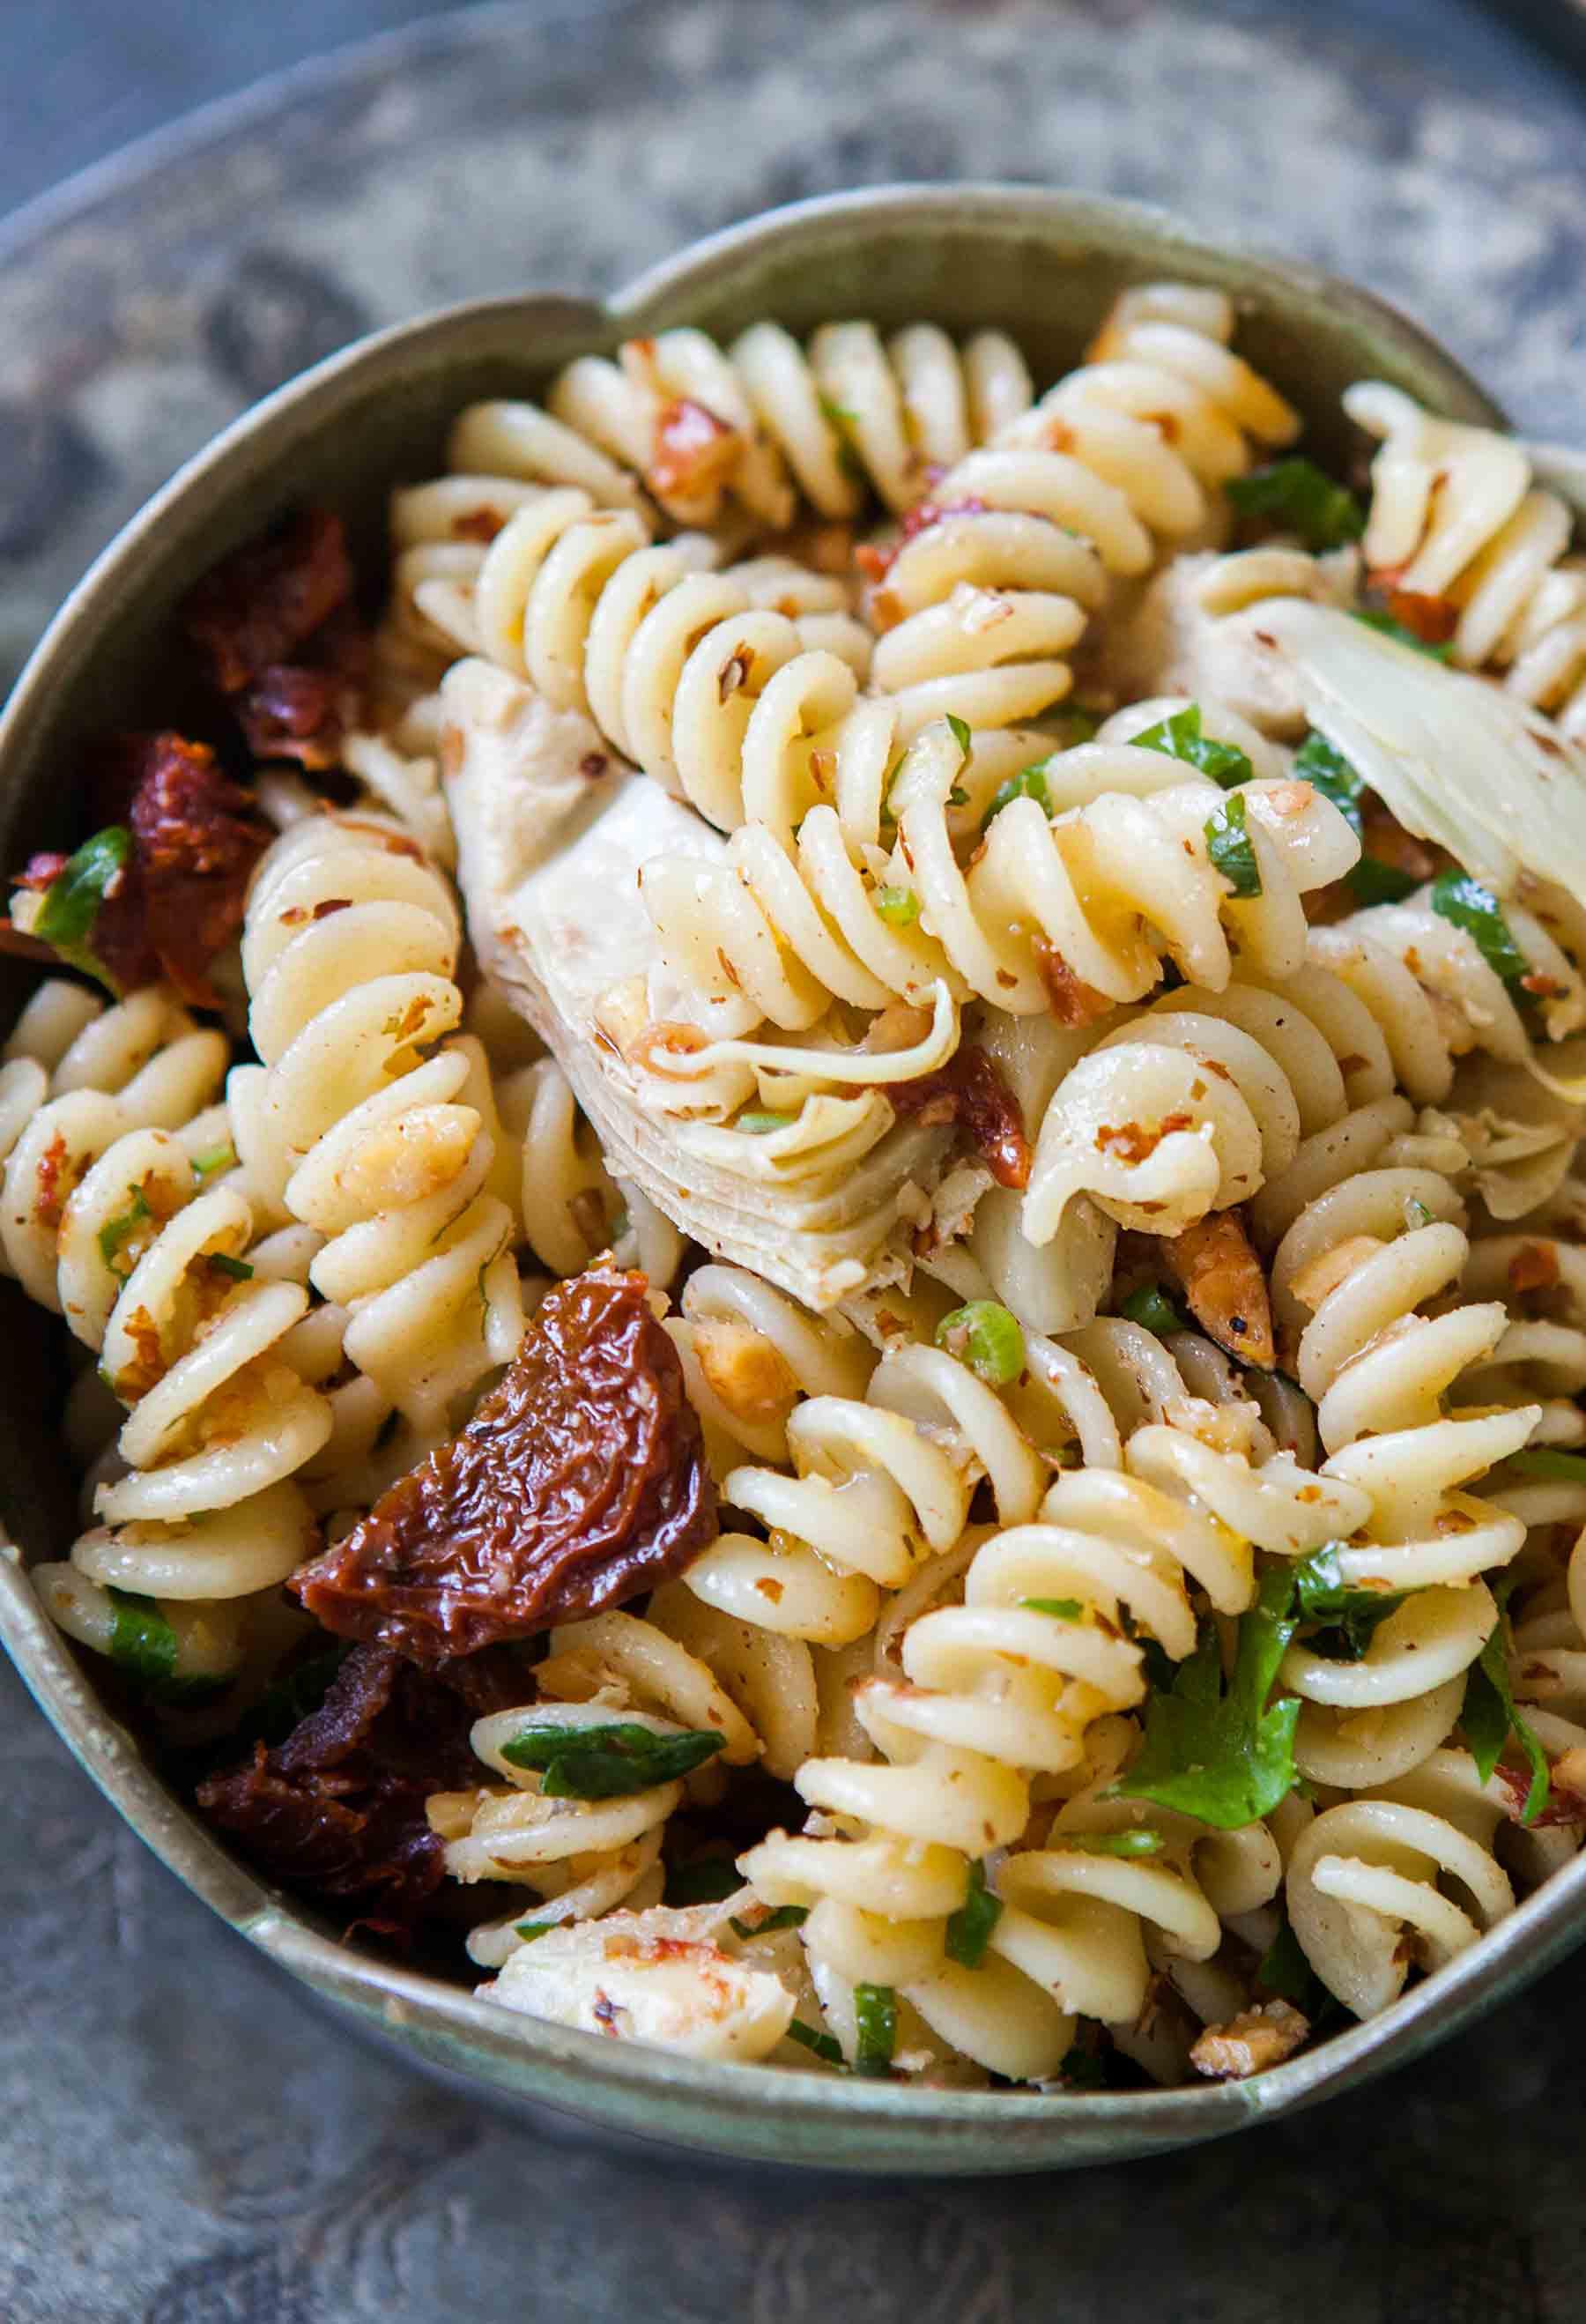 Vegan Artichoke Sun-dried Tomato Pasta Salad